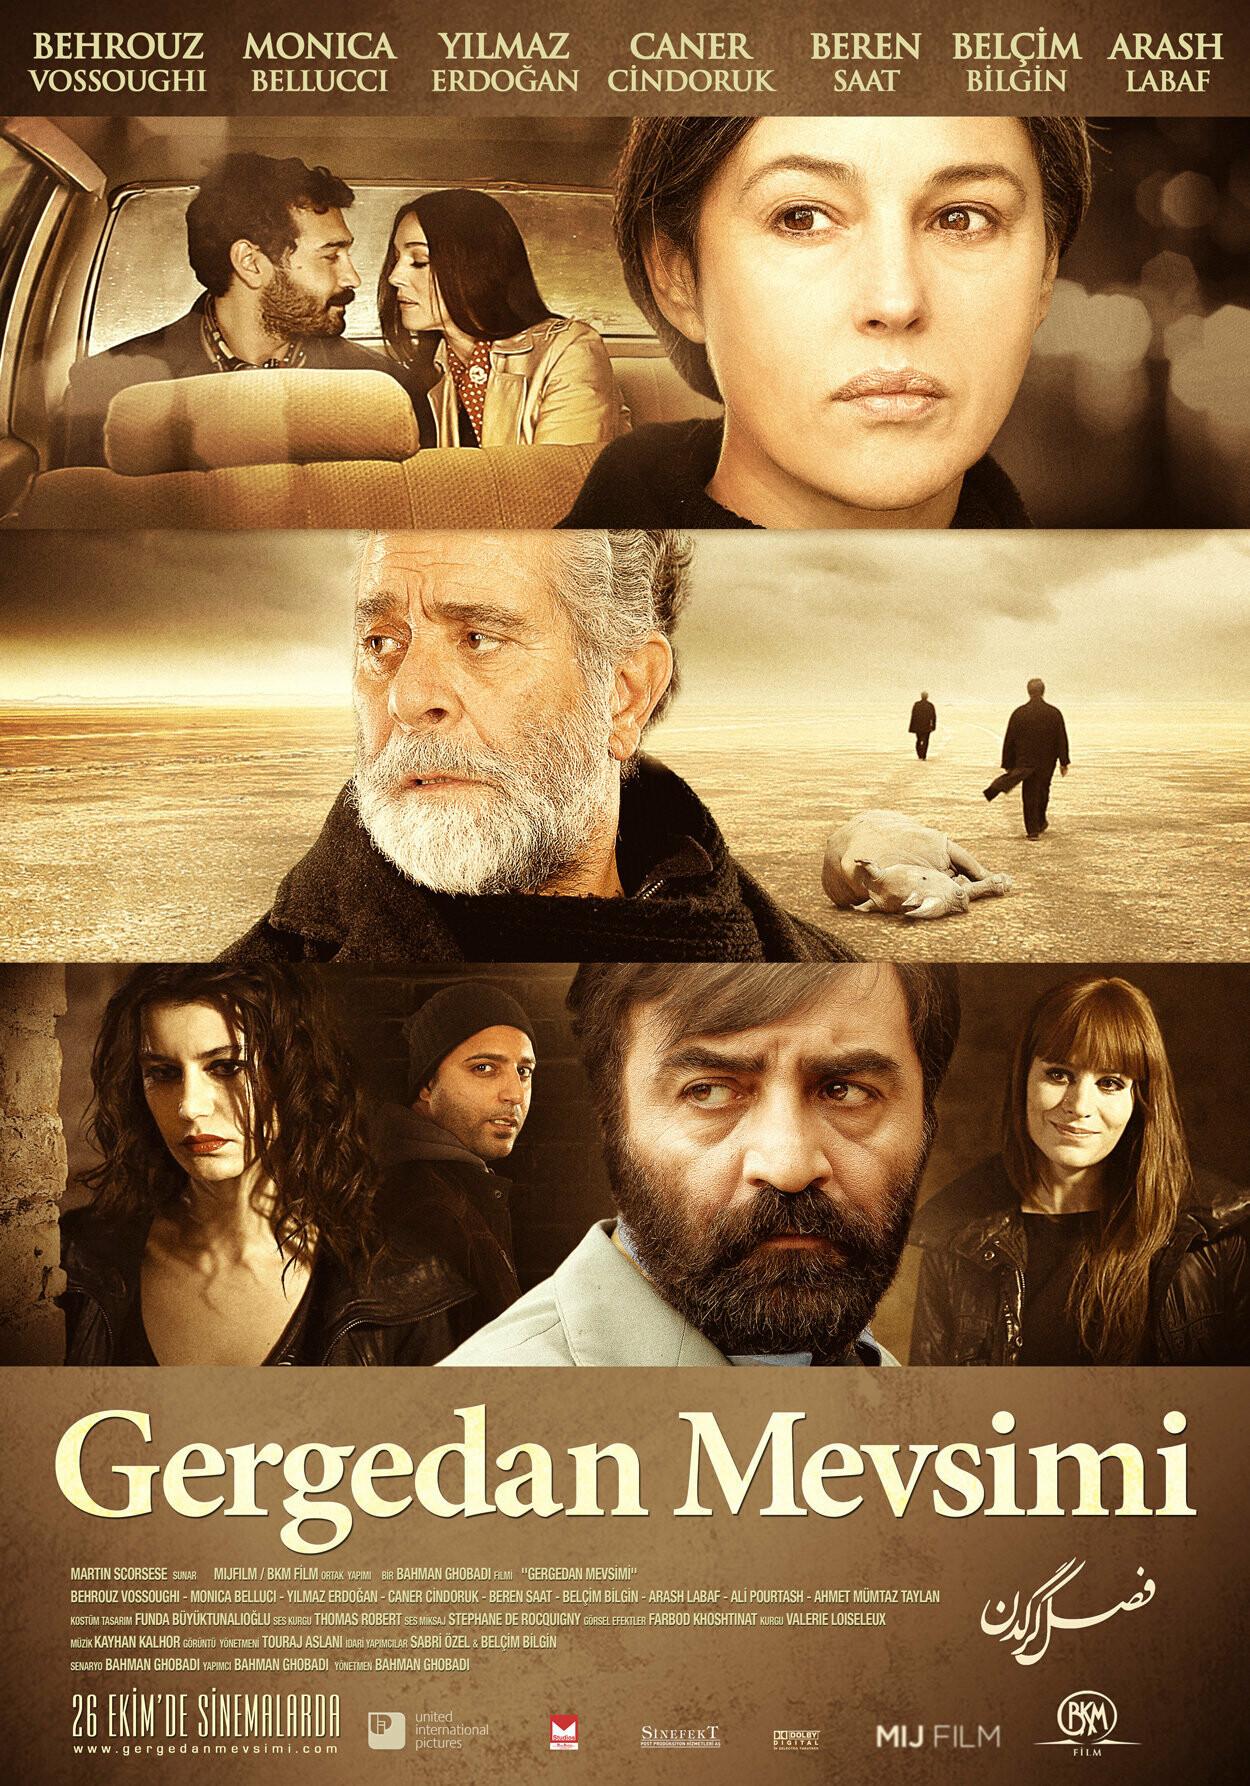 Gergedan Mevsimi (2012) [TR] 1080p AMZN WEB-DL AAC2.0 H.264